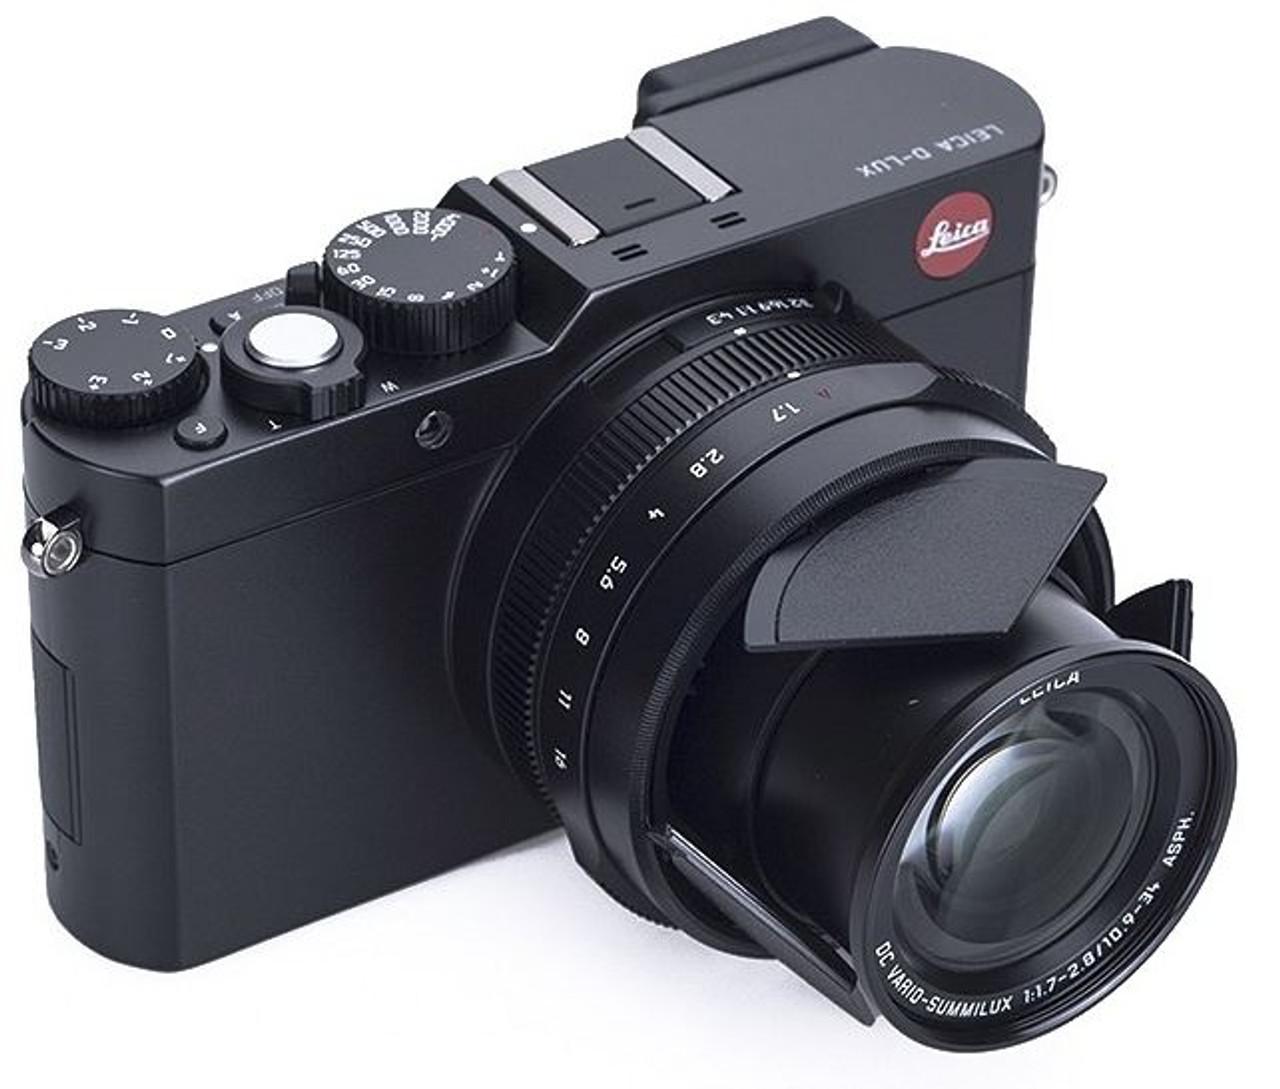 Leica Auto Lens Cap for D-Lux Cameras (Black)